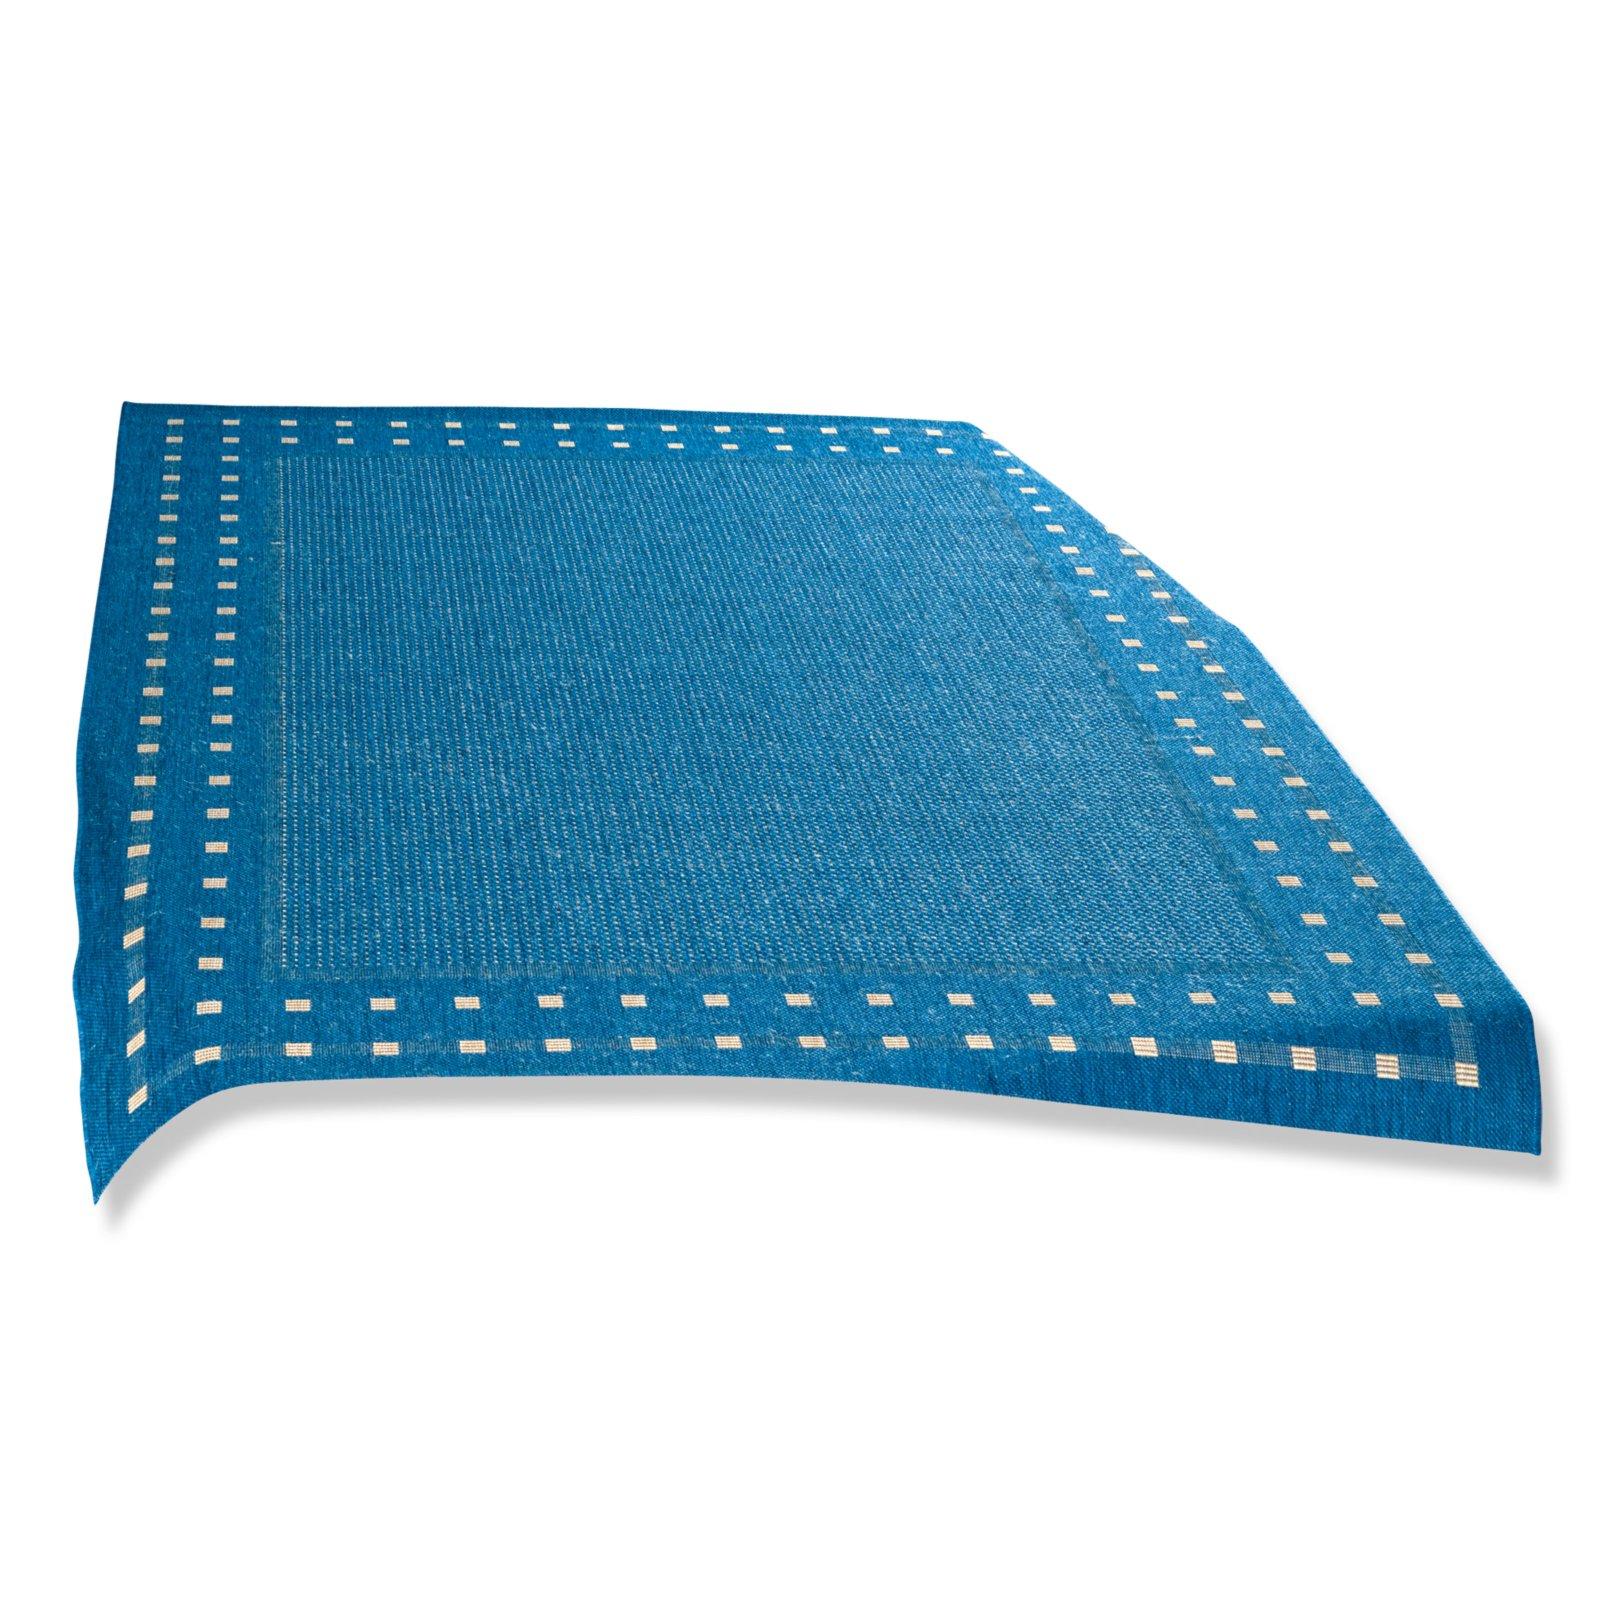 teppich olso blau 120x170 cm gemusterte teppiche. Black Bedroom Furniture Sets. Home Design Ideas